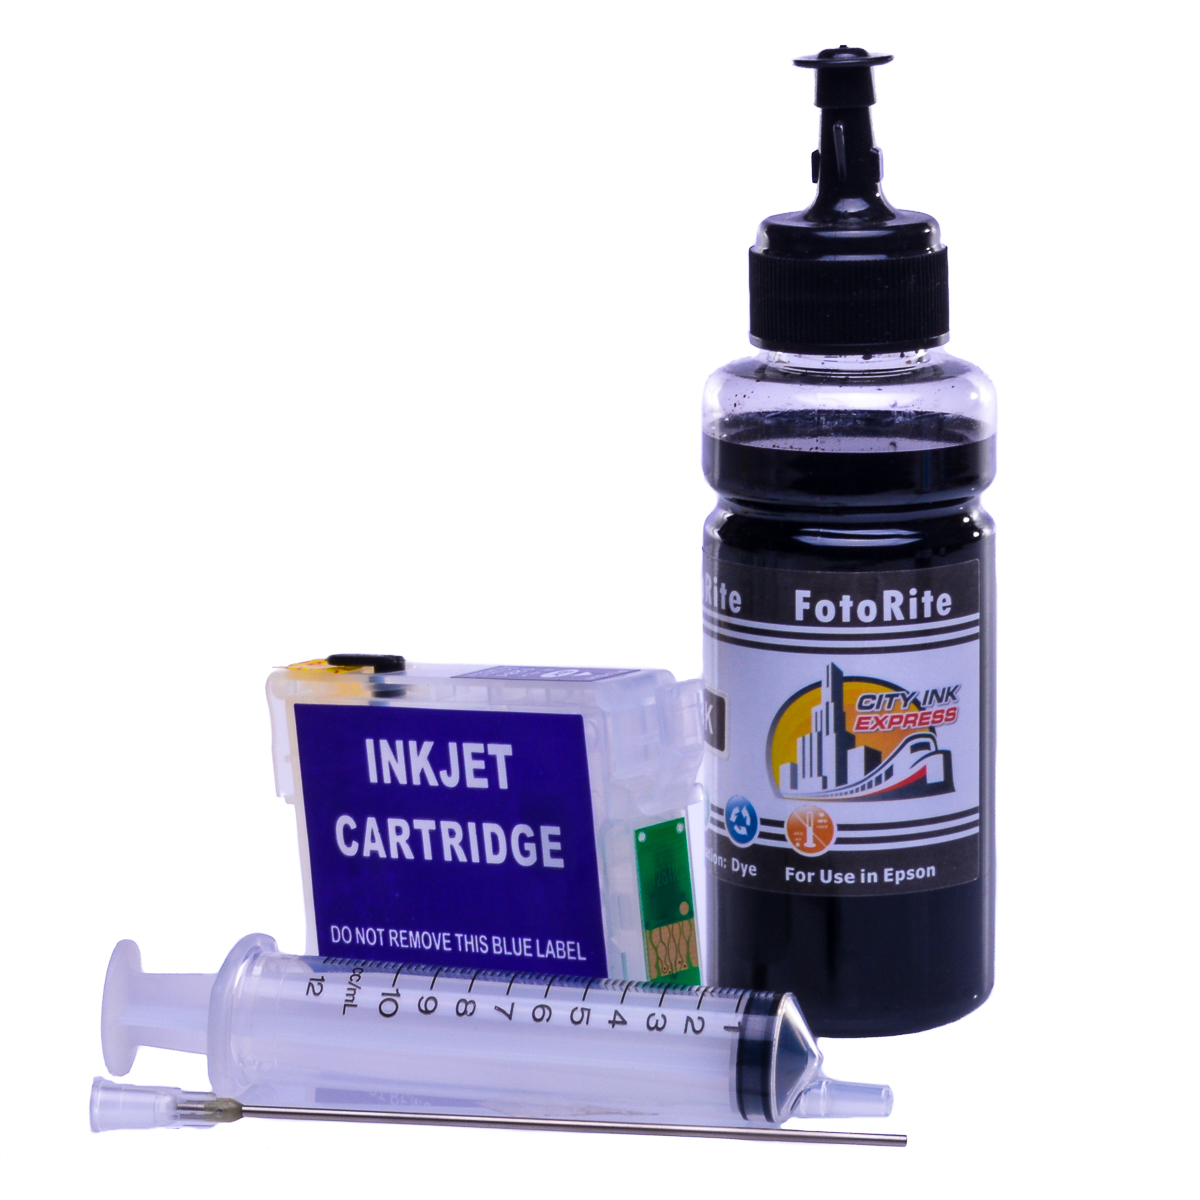 Refillable T0801 Black Cheap printer cartridges for Epson Stylus PX820FWD C13T08014010 dye ink